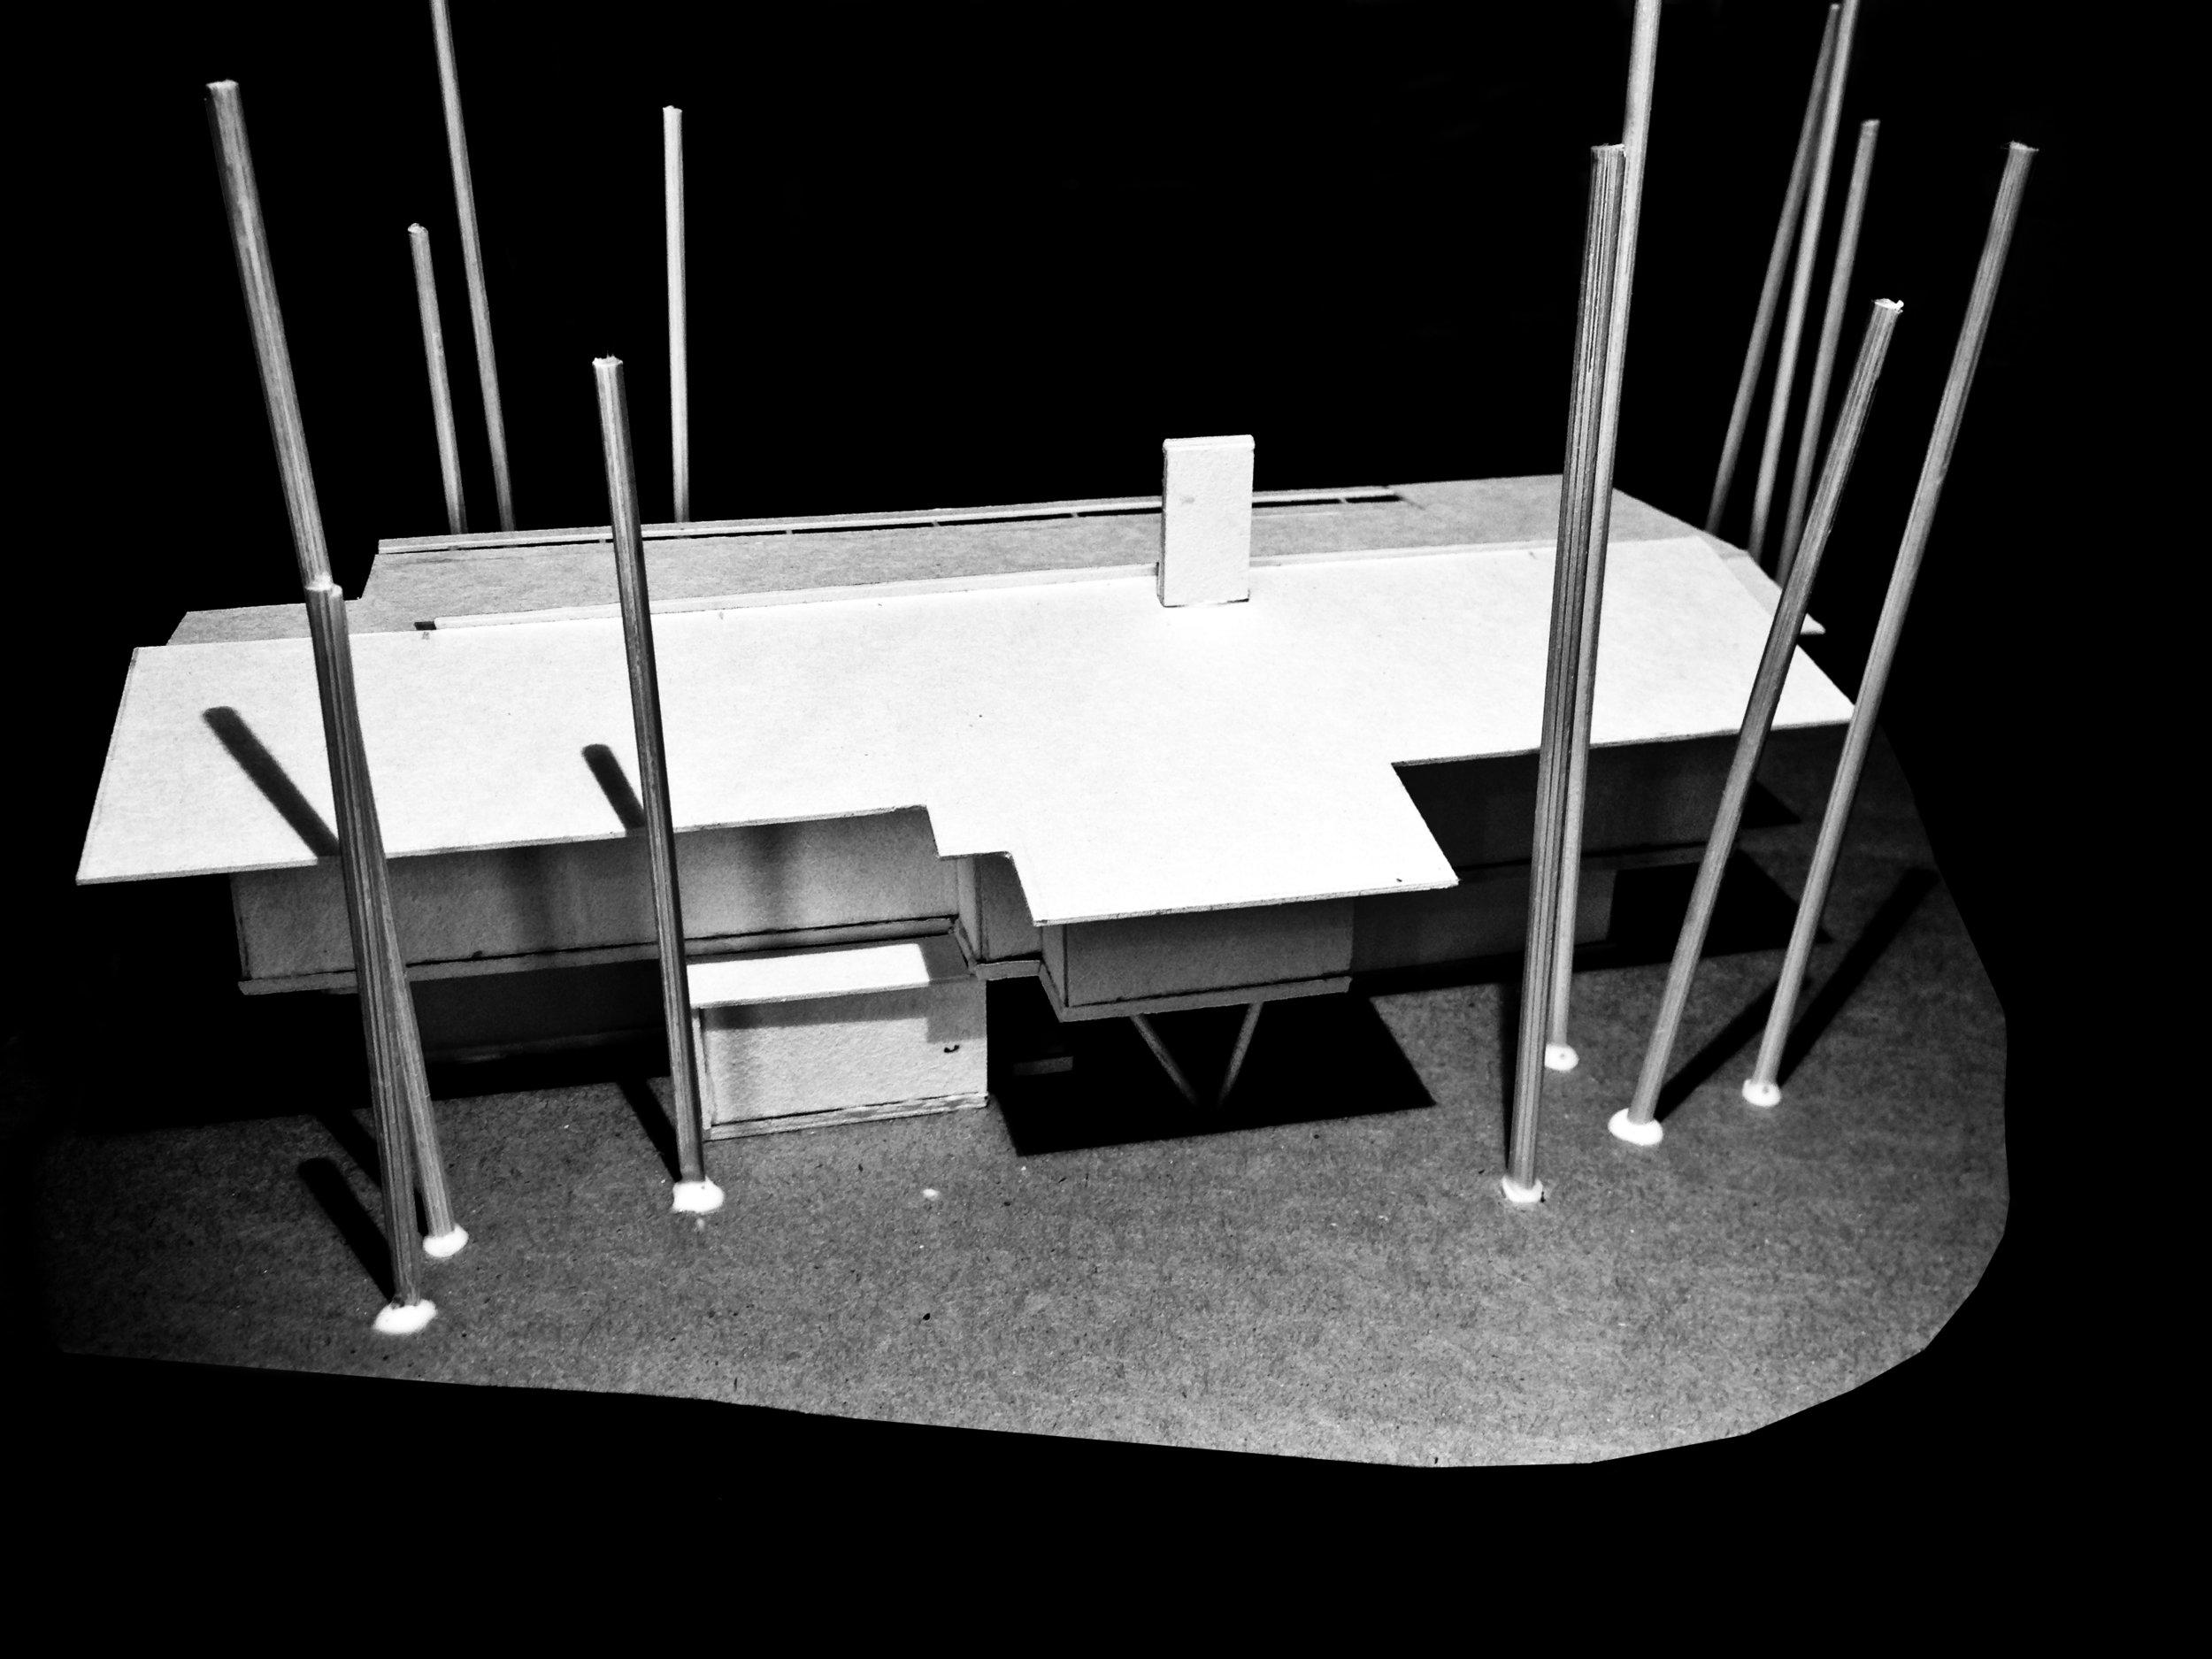 2 Storey Building design model - Parkside View